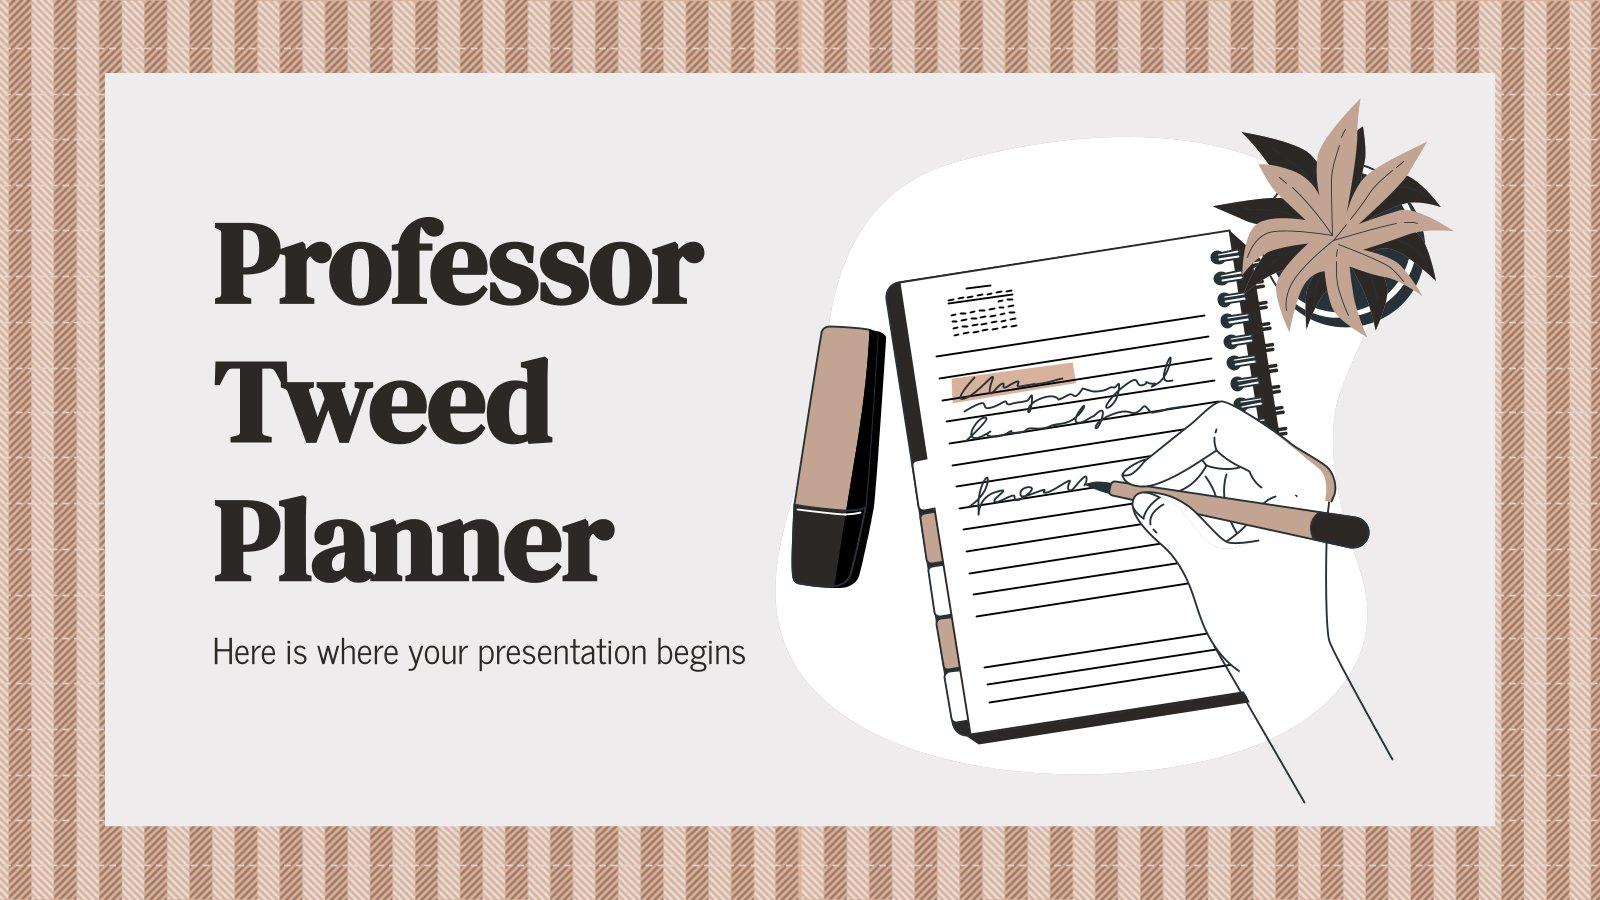 Professor Tweed Planner presentation template